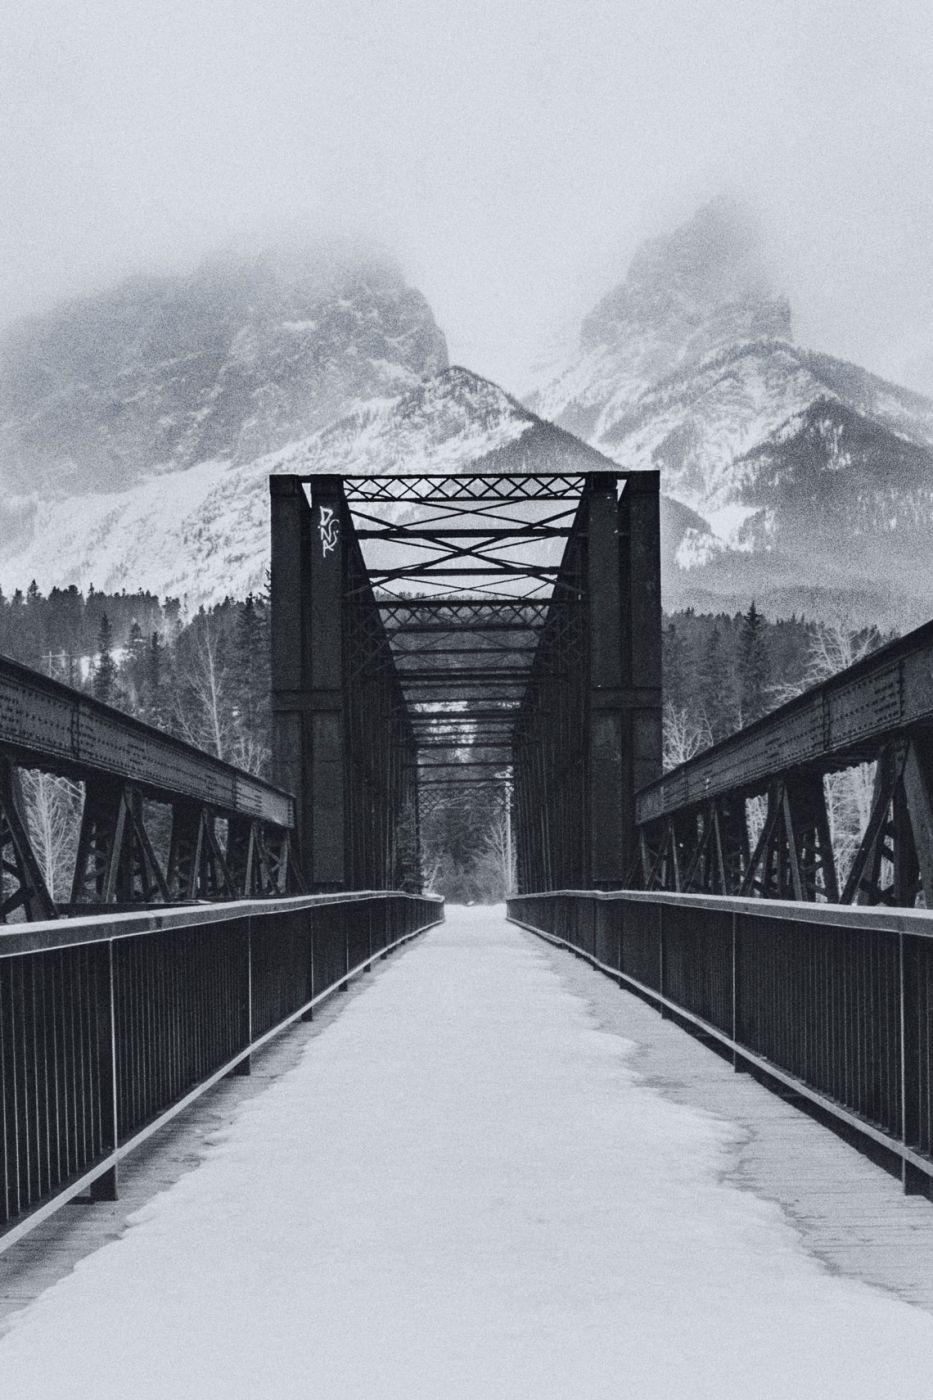 Canmore Engine Bridge, Canada